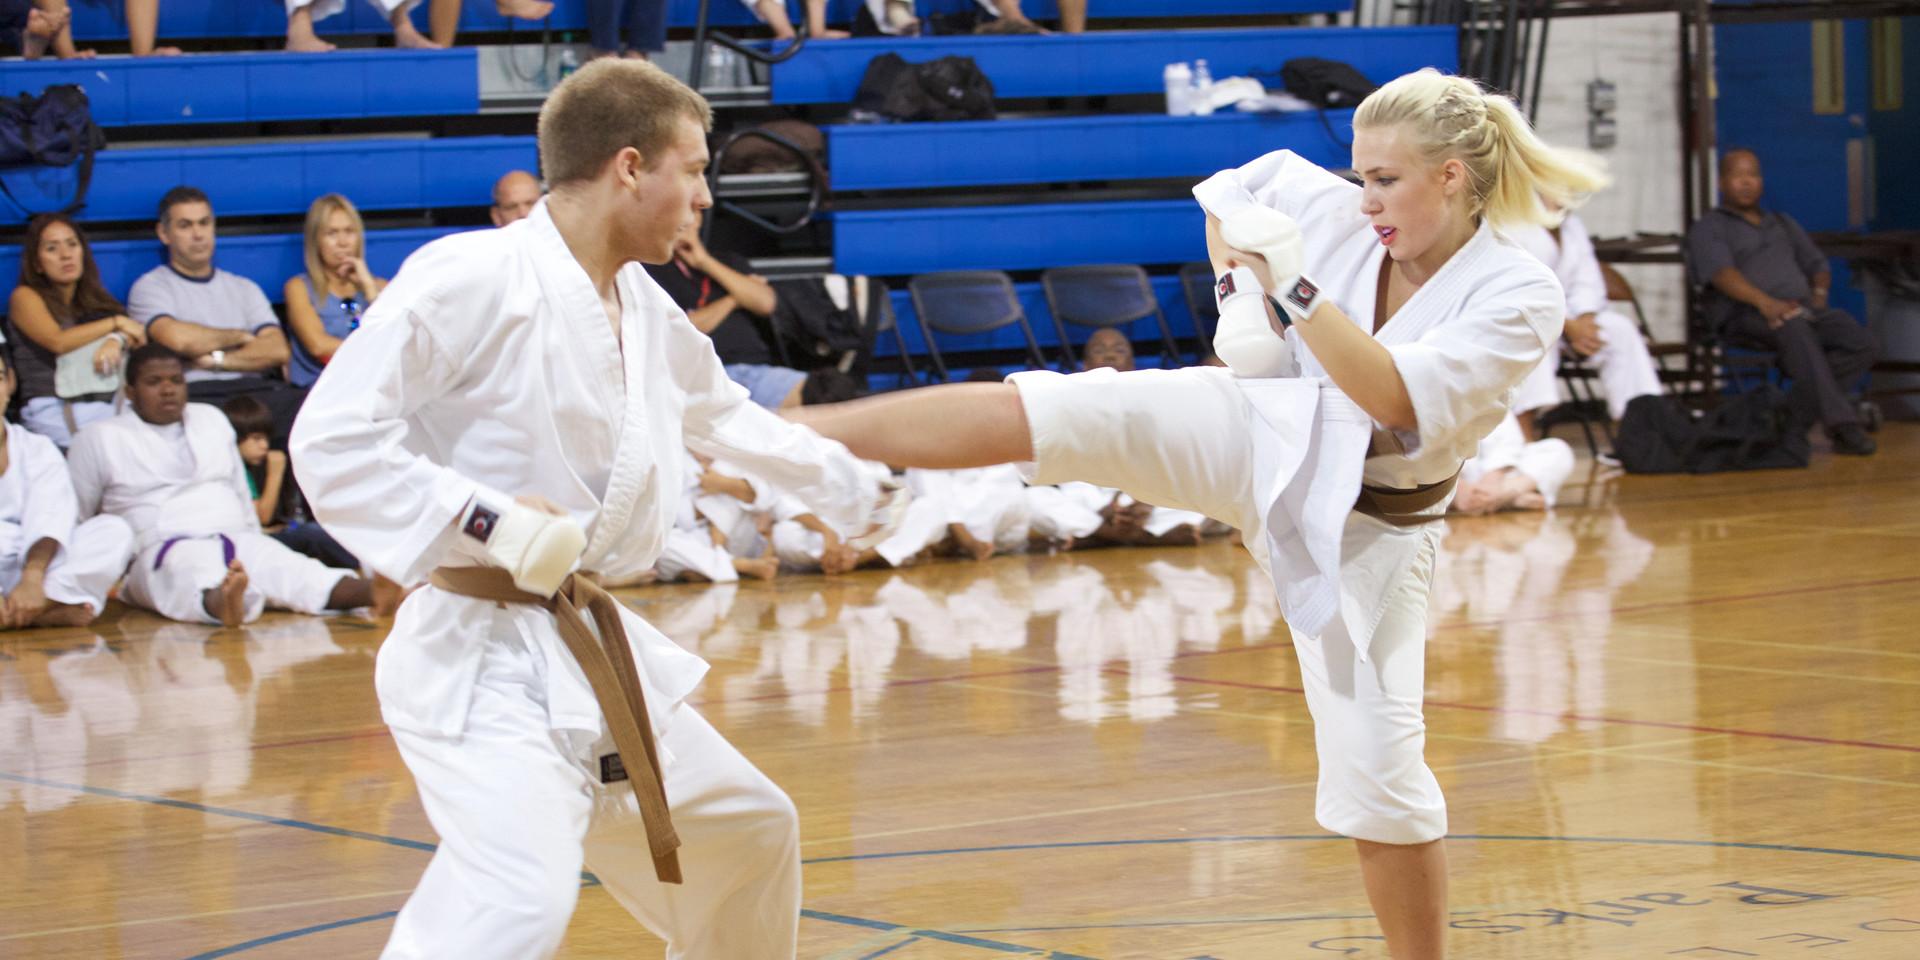 EPride_KaratePics-103.jpg